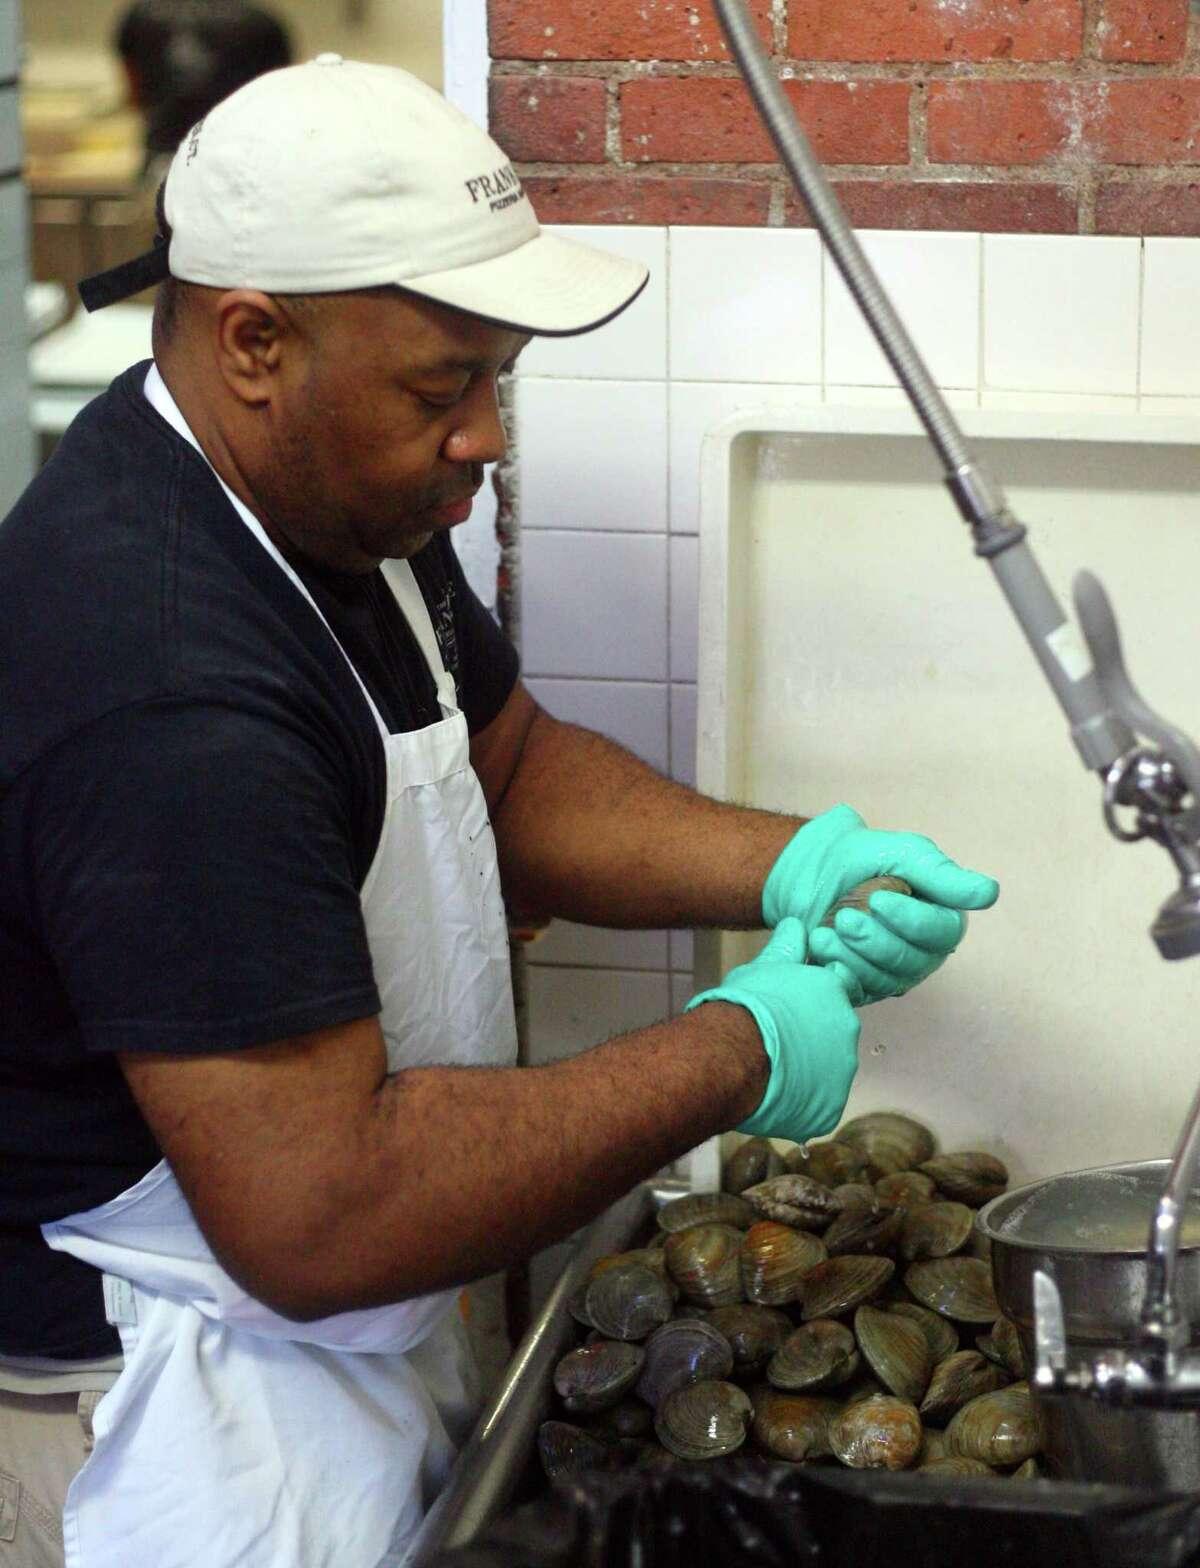 Erik Preston takes care of the clams at Frank Pepe Pizzeria Napoletana in New Haven.